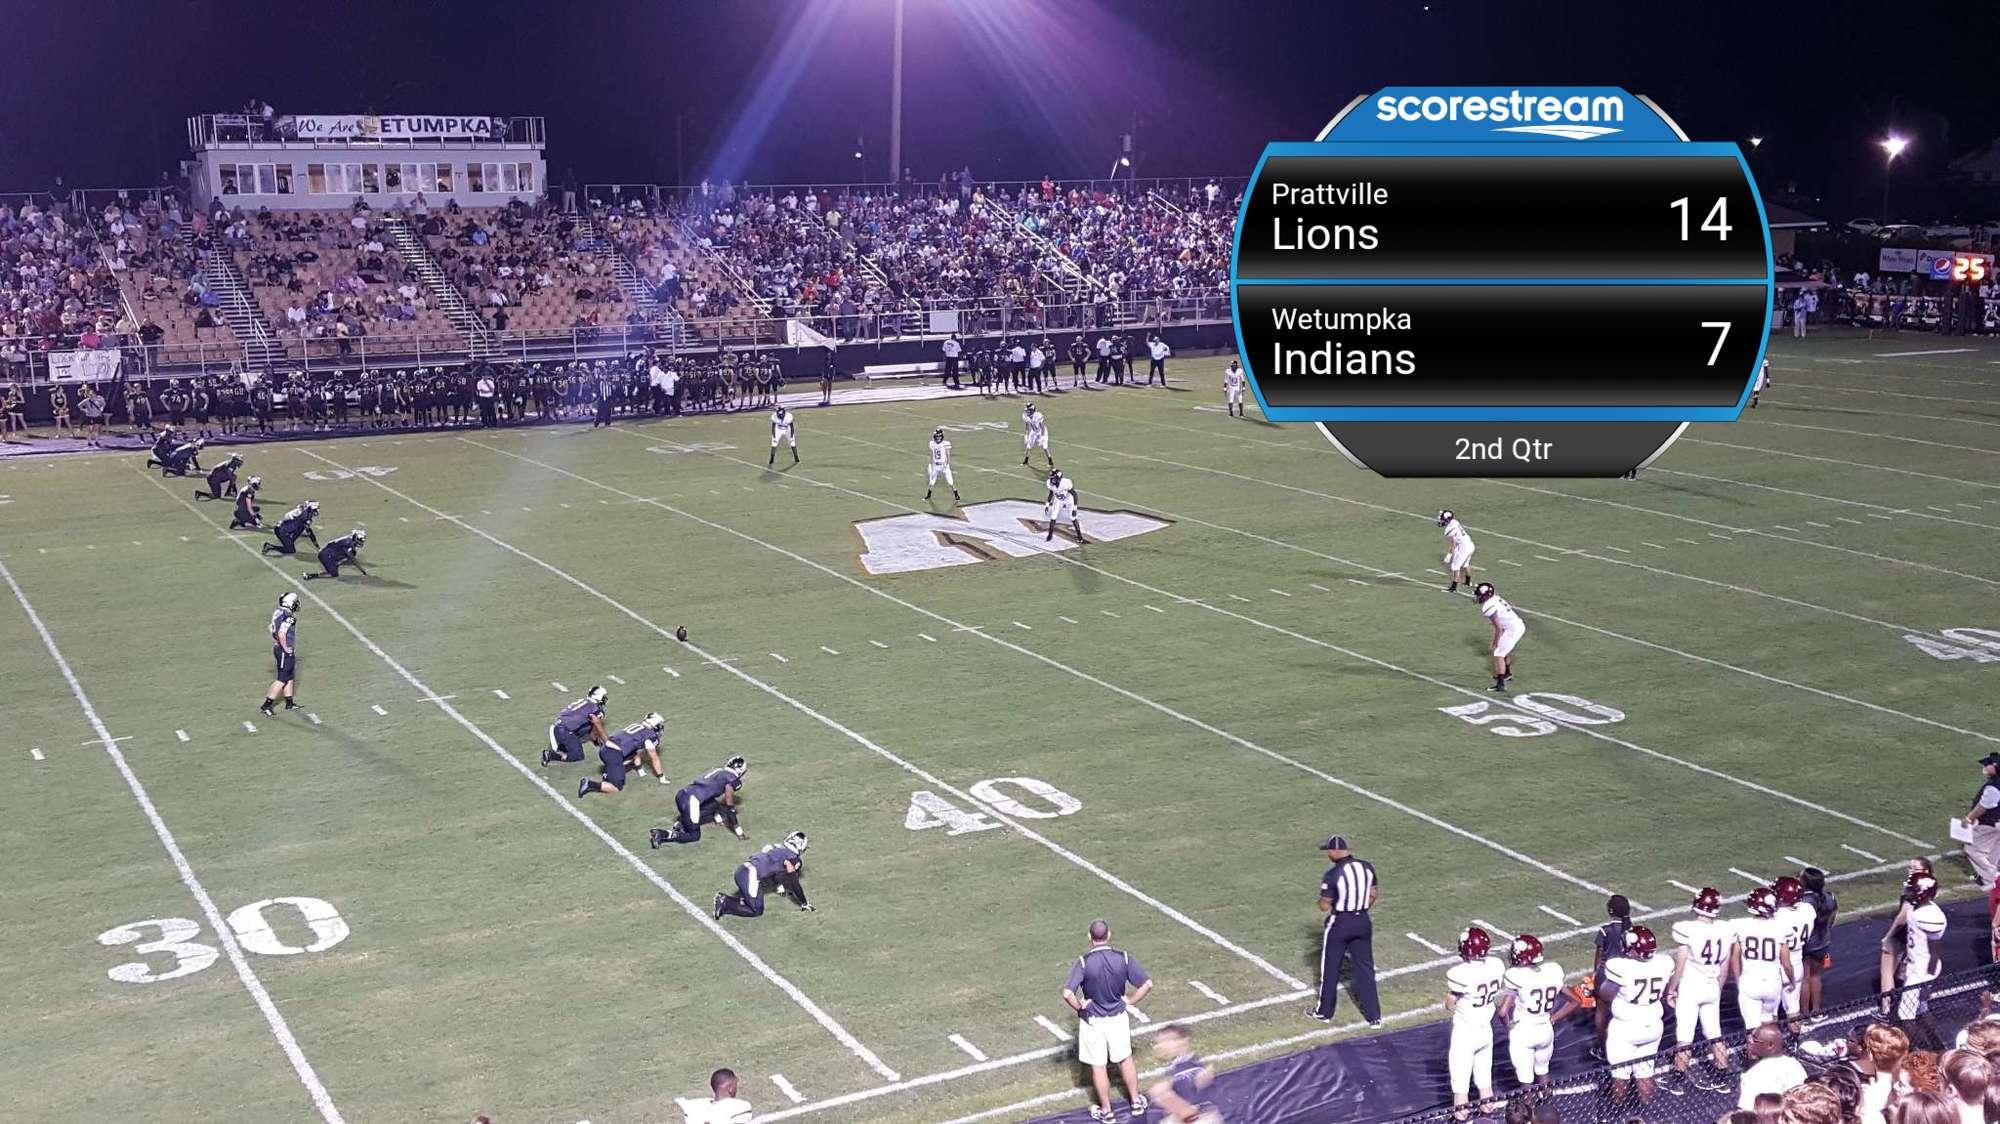 The Prattville Lions Vs The Wetumpka Indians Scorestream